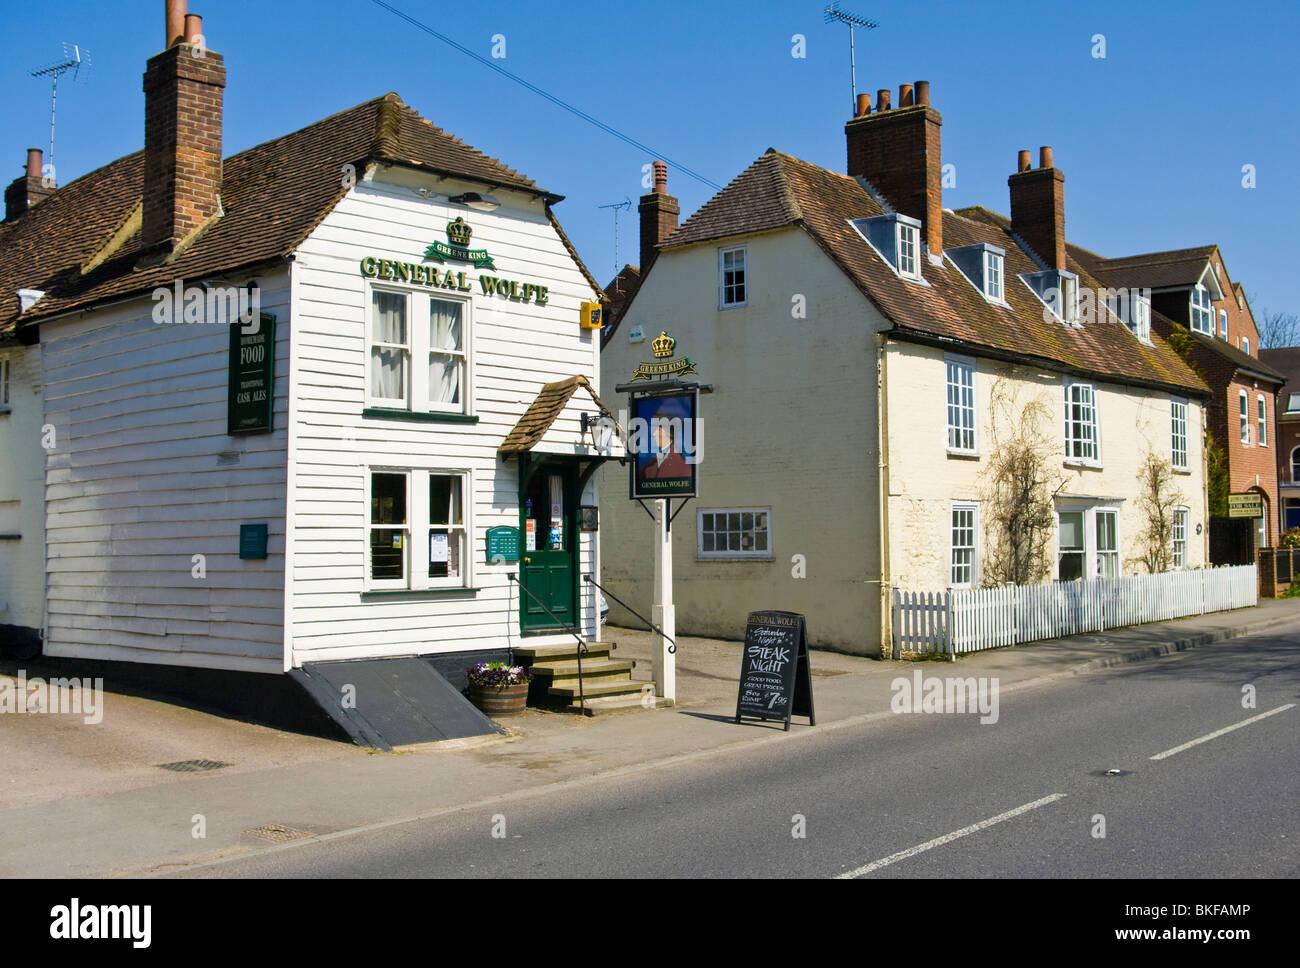 The General Wolfe Public House Westerham Kent England - Stock Image